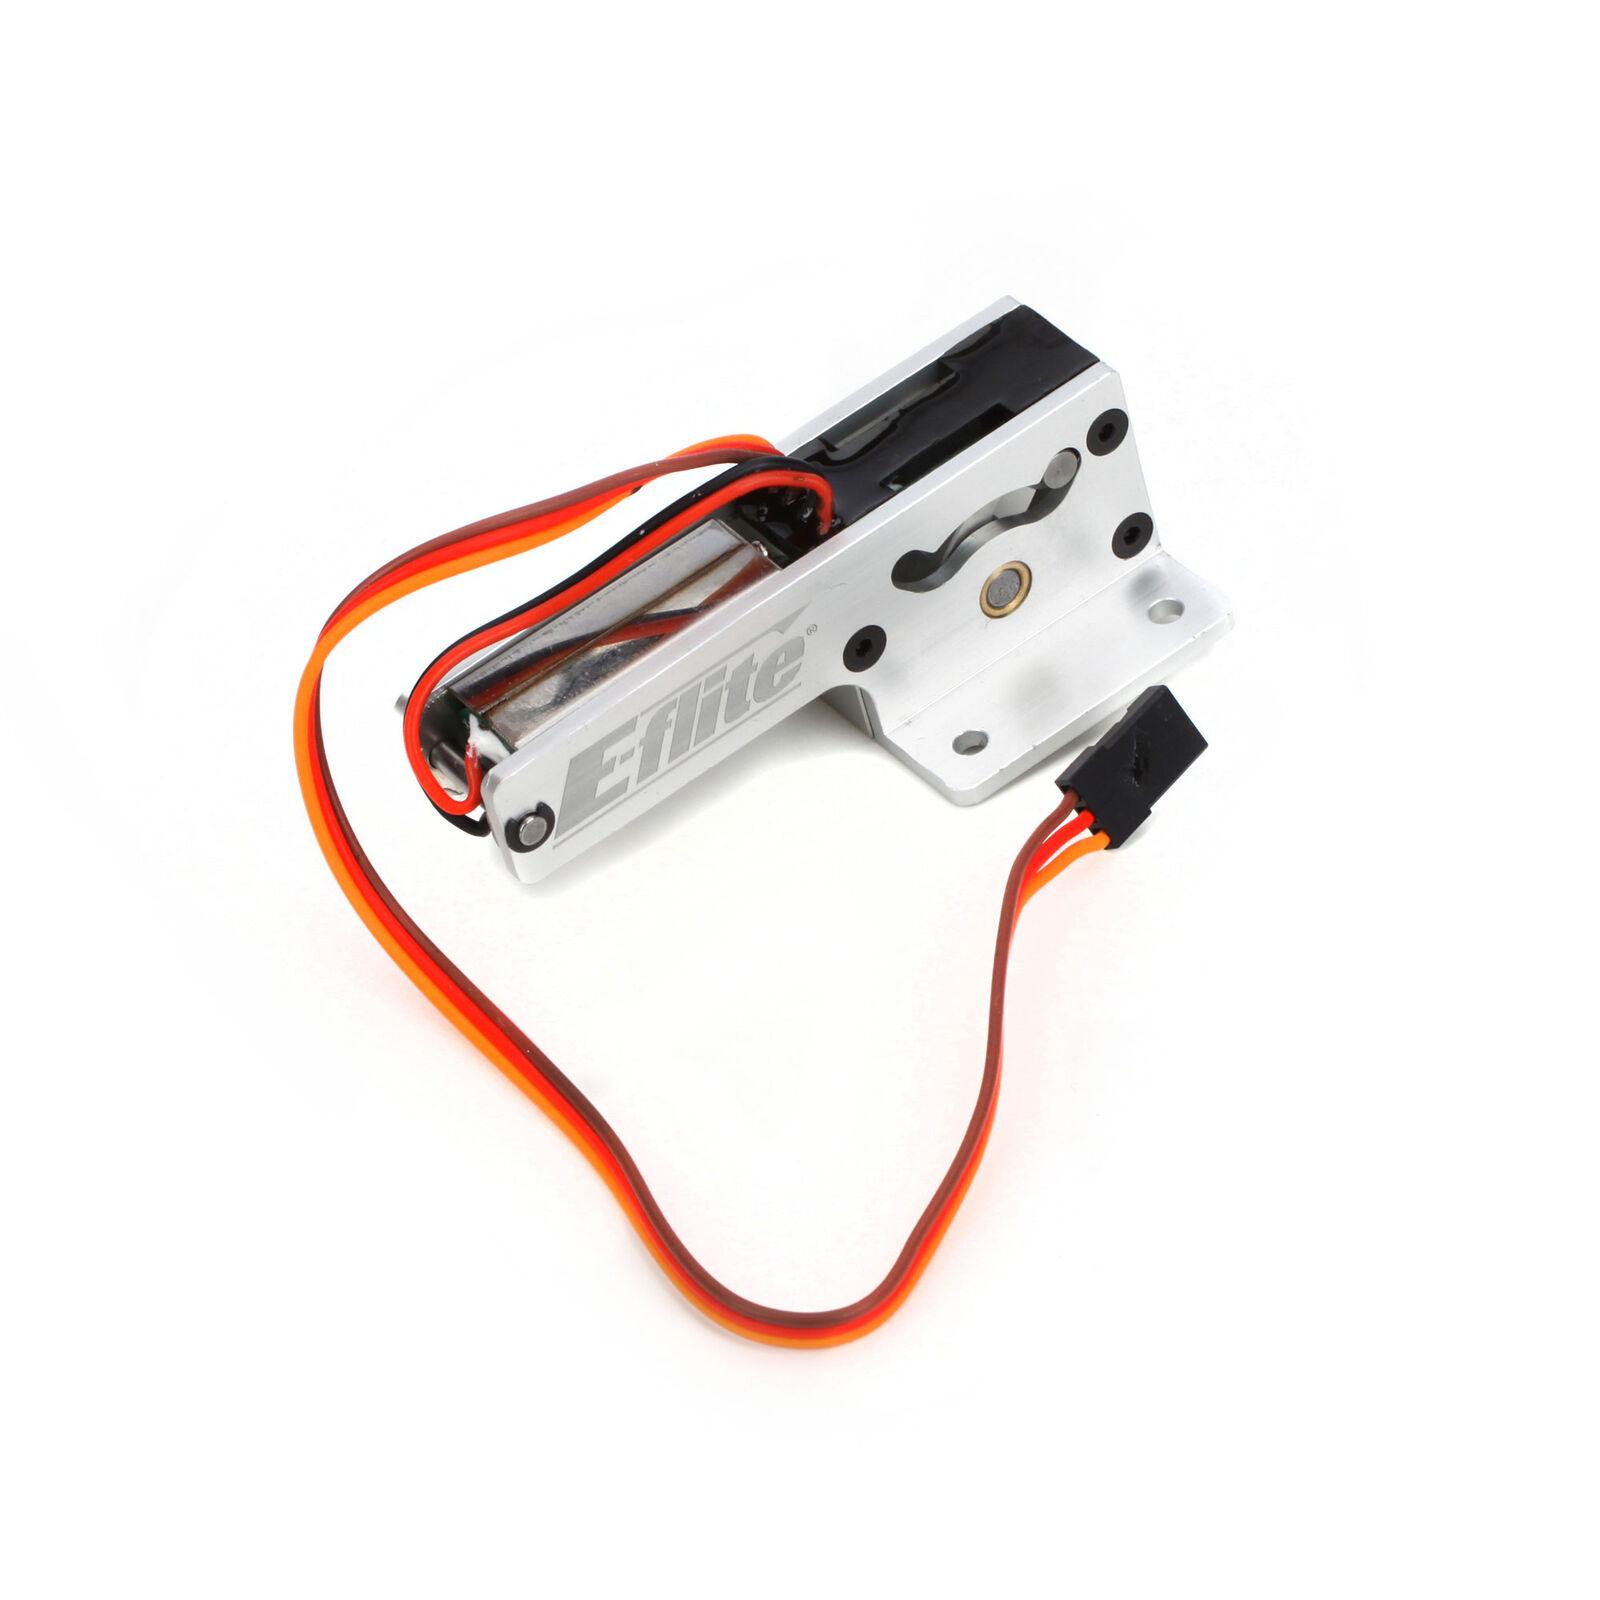 25 - 46 90-Degree Main Electric Retract Unit